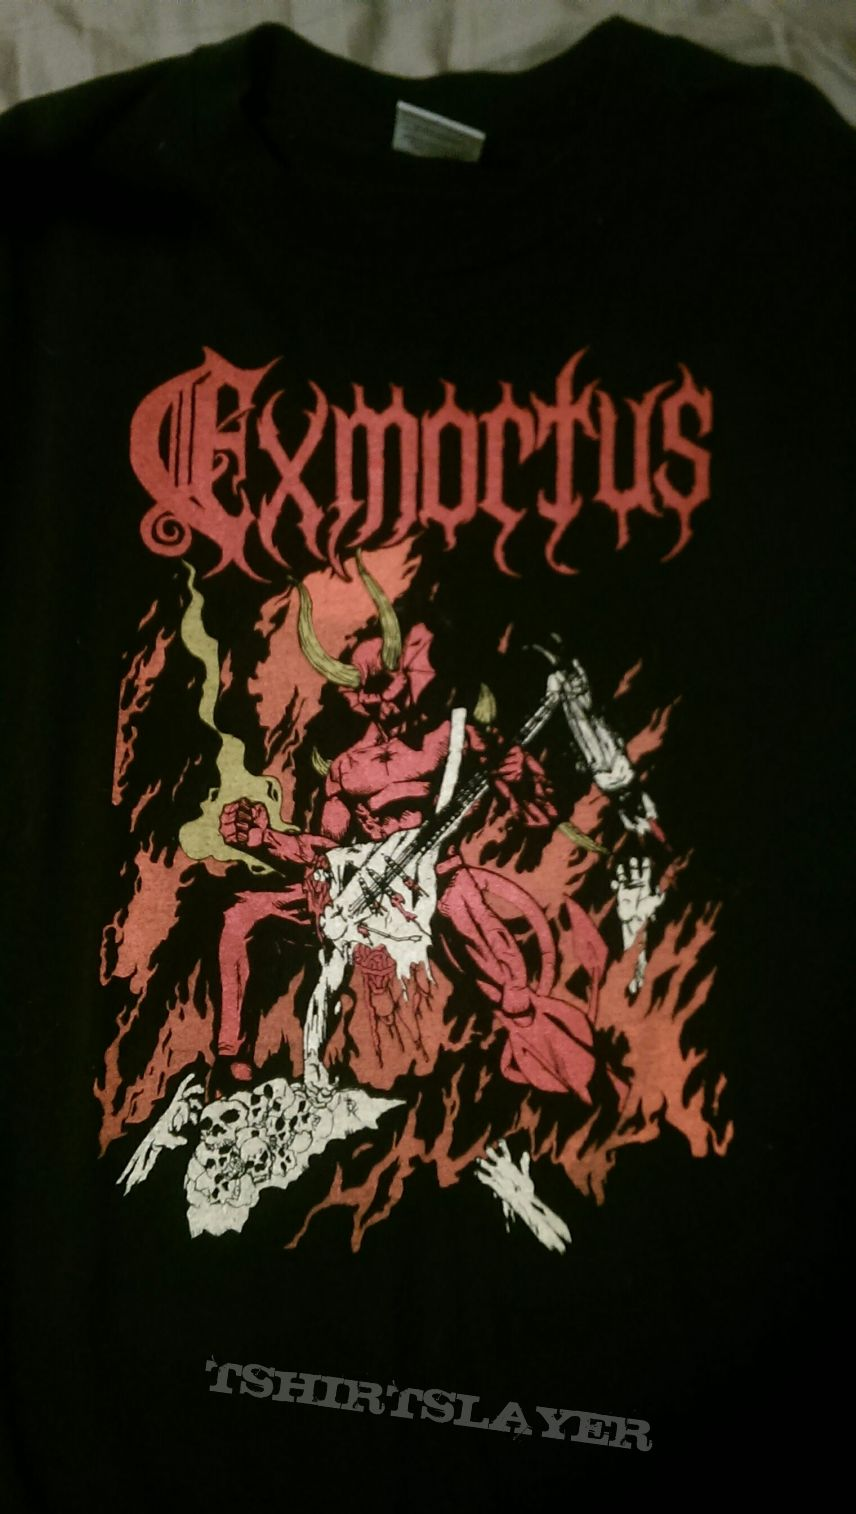 Speed_Metal_Drunk's Exmortus, Exmortus Shirt TShirt or ...